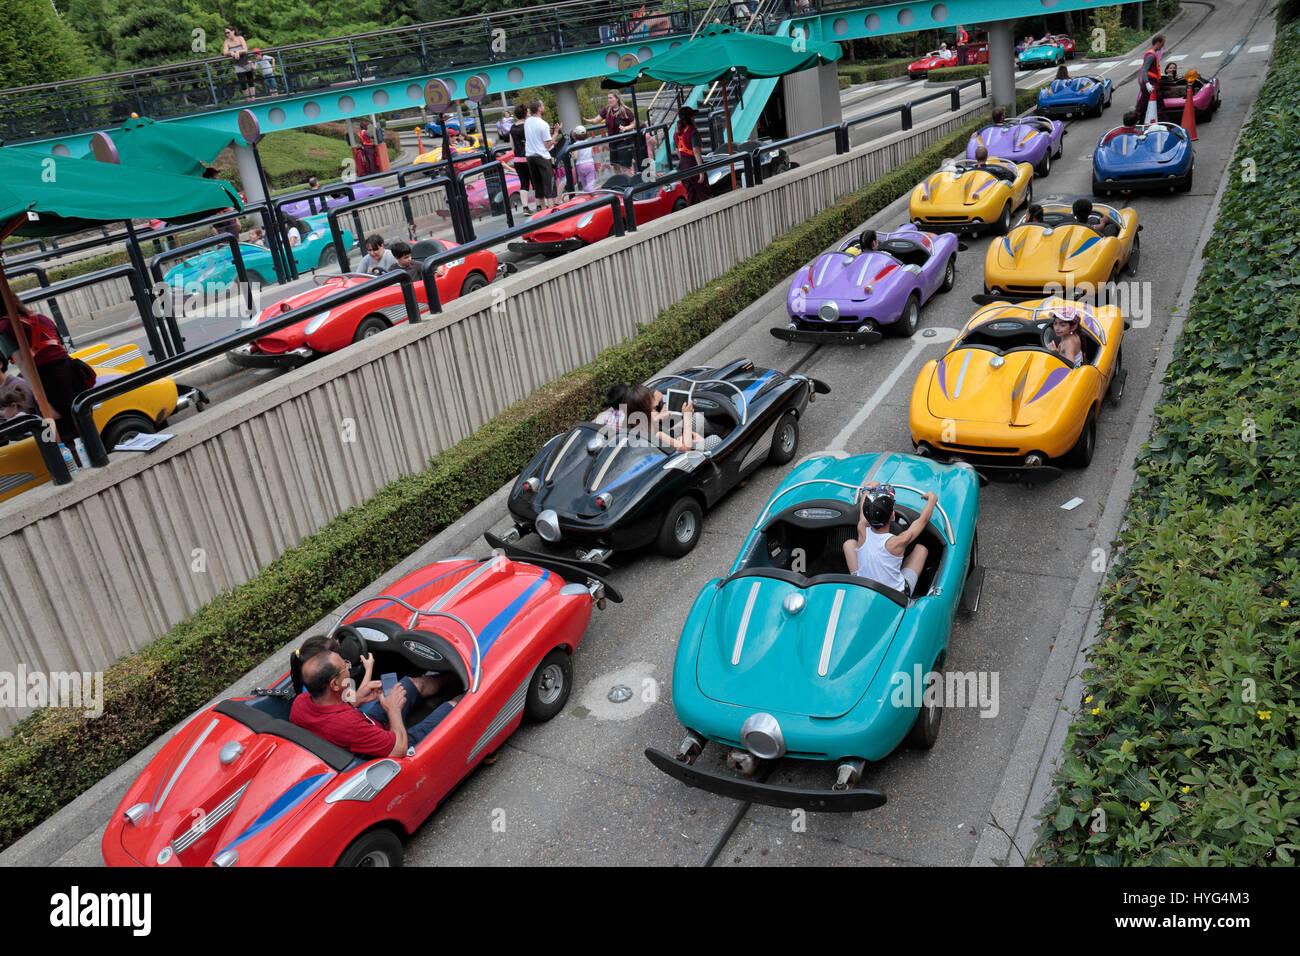 Disney Race Car Ride